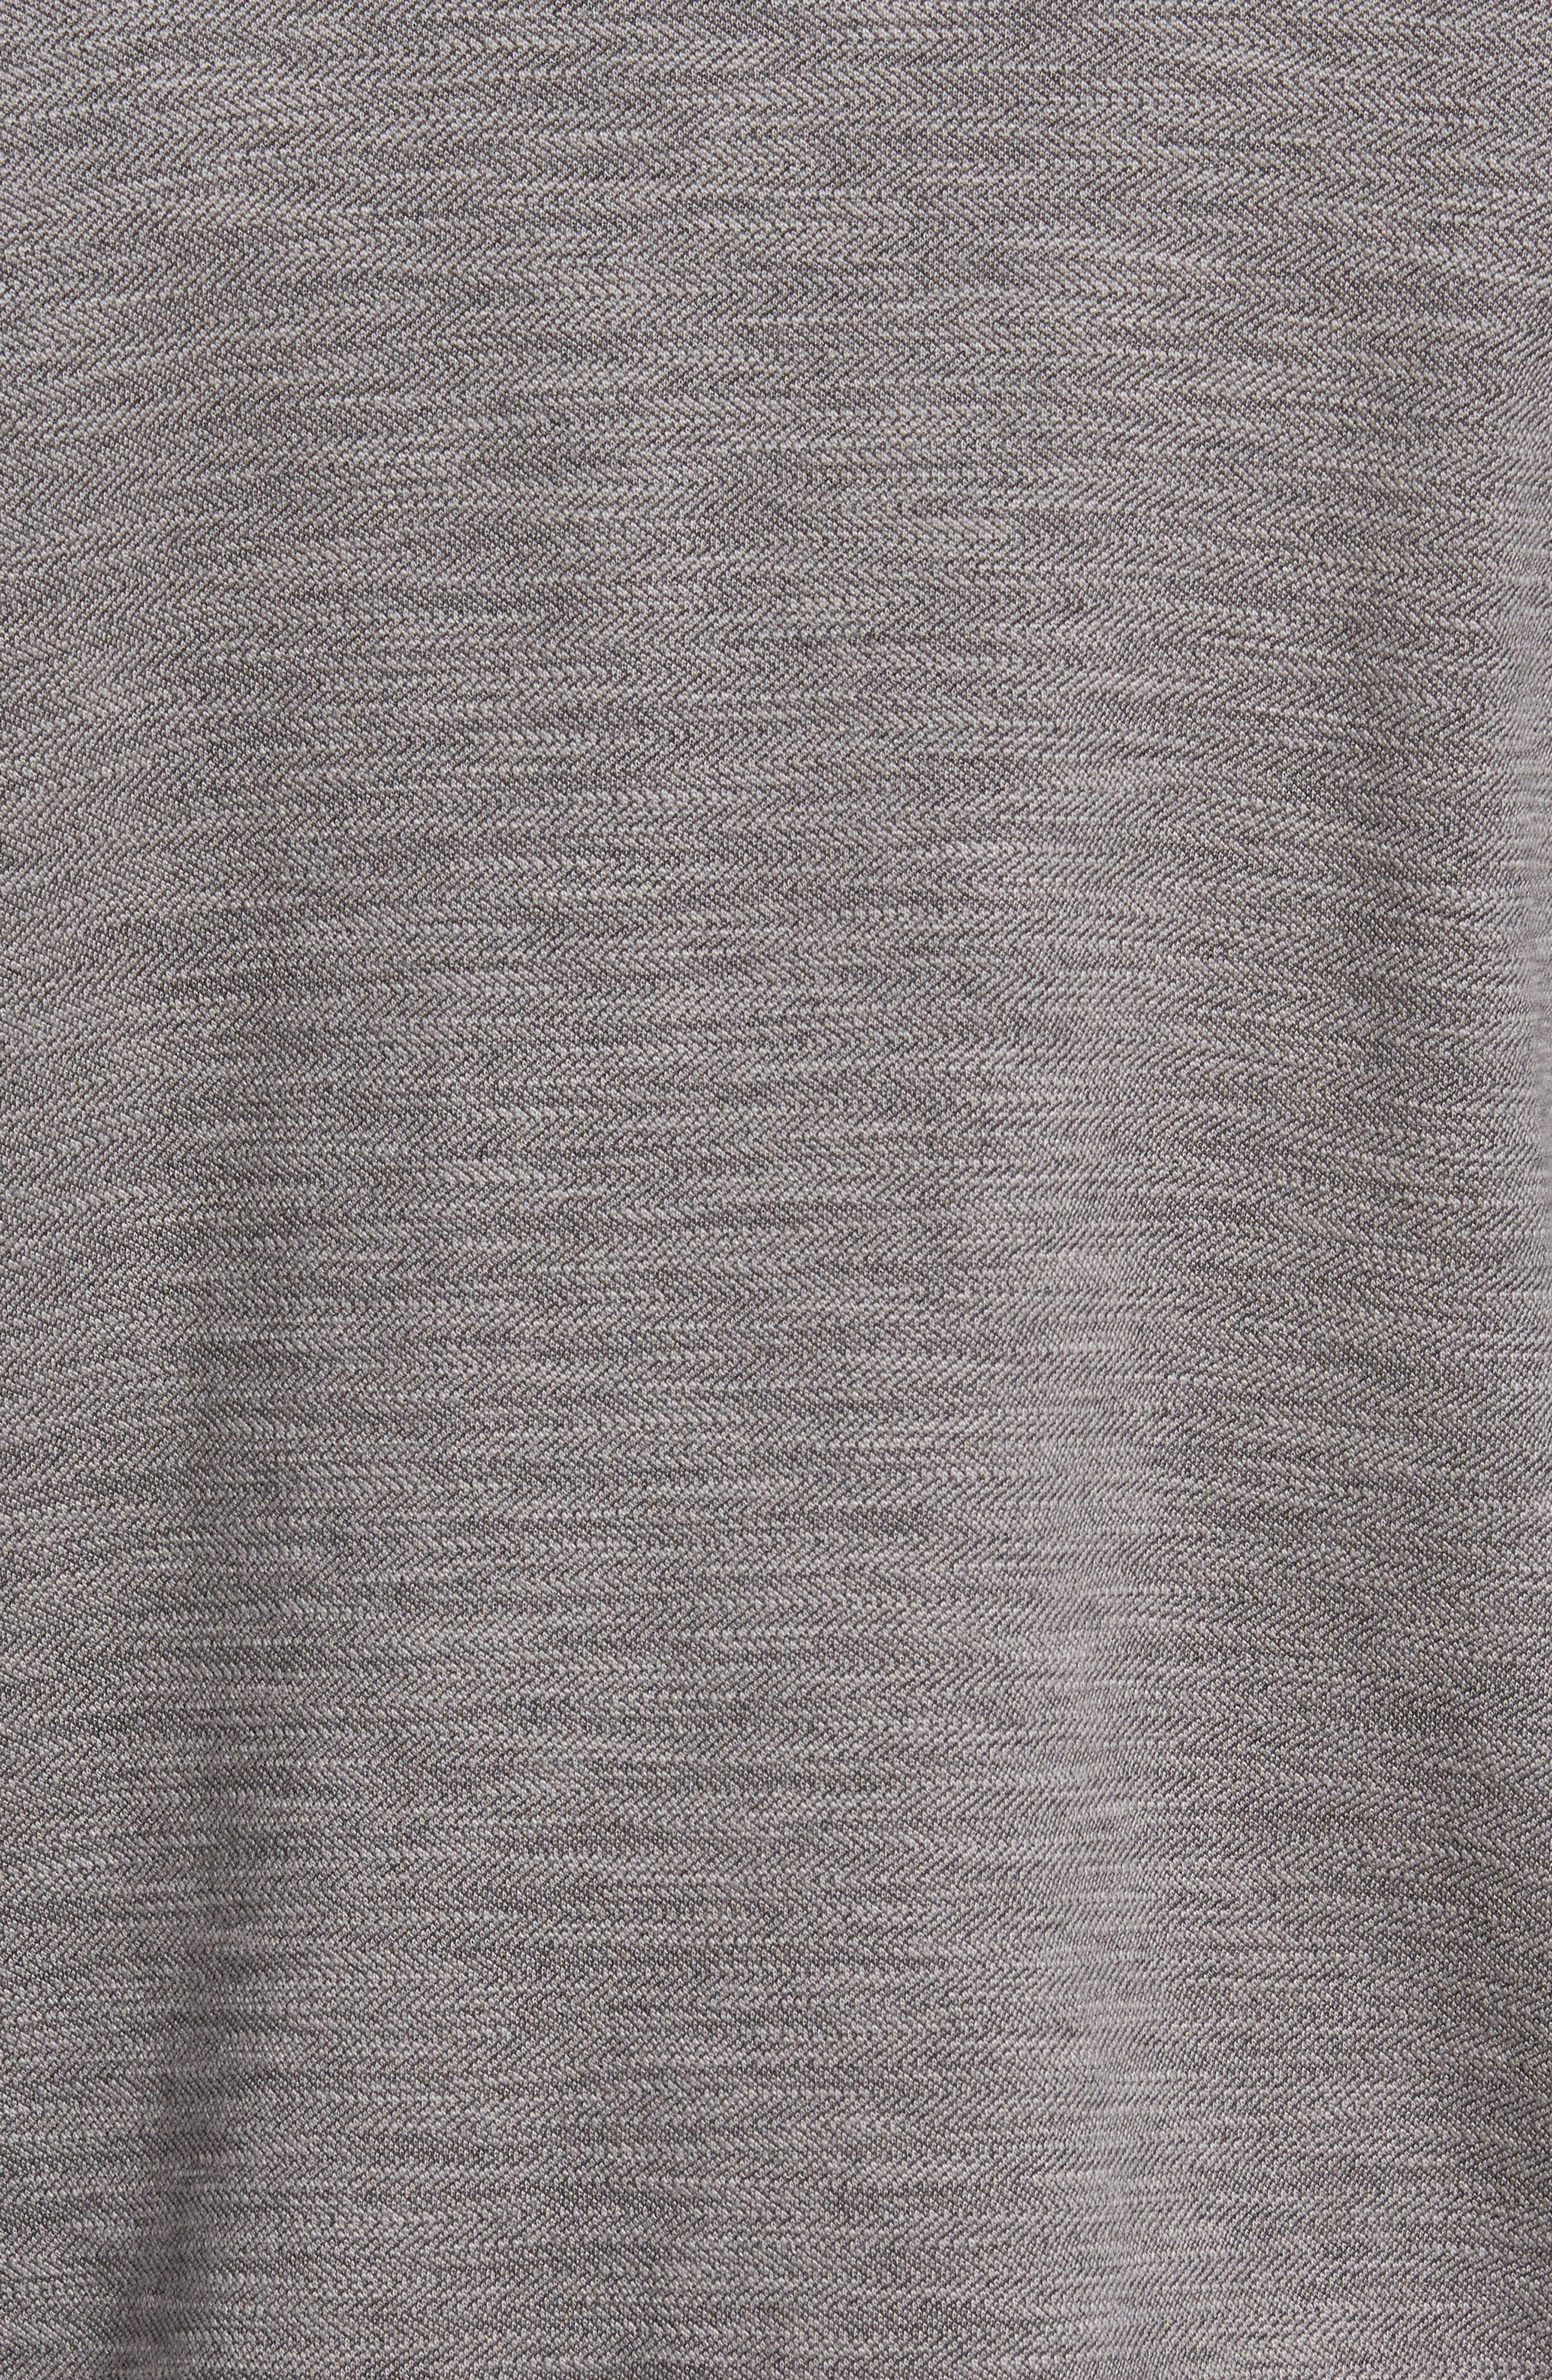 Sandbar Slub Reversible Quarter Zip Pullover,                             Alternate thumbnail 5, color,                             005